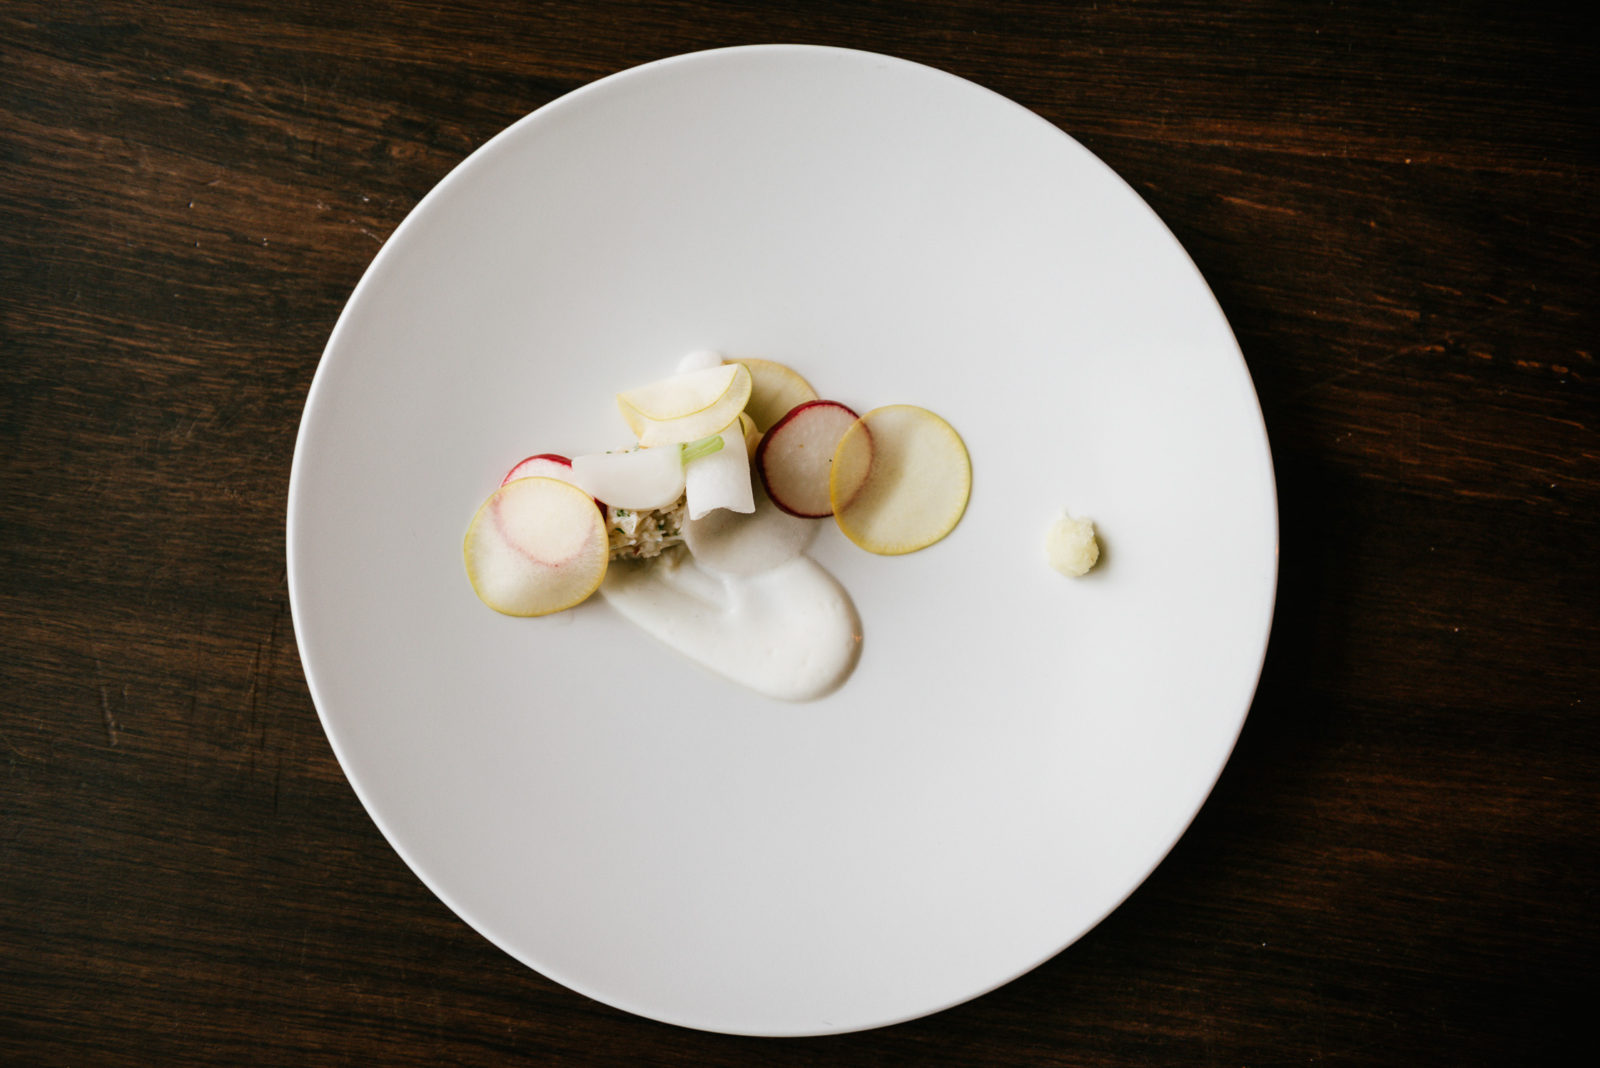 Turnip with smoked yoghurt, radish and crab salad